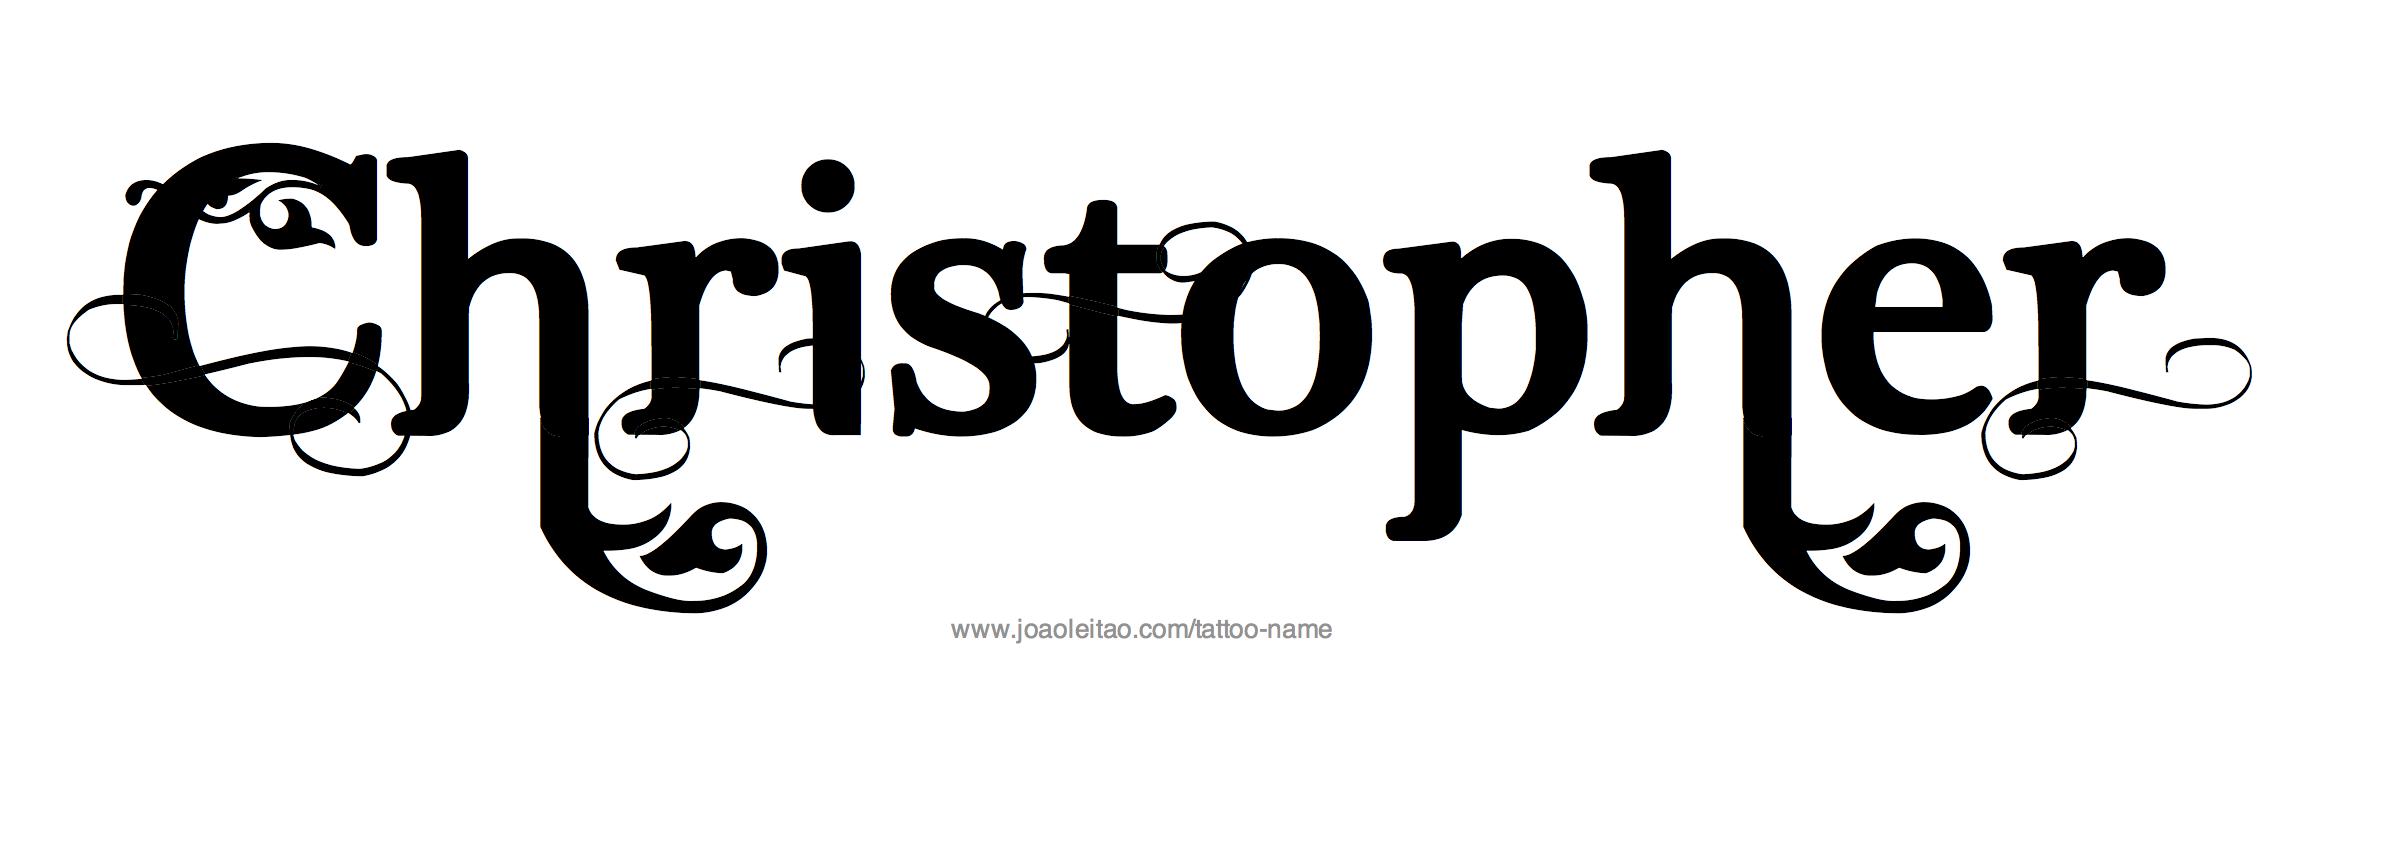 Christopher Name Tattoo Designs Name Tattoos Names Name Tattoo Designs